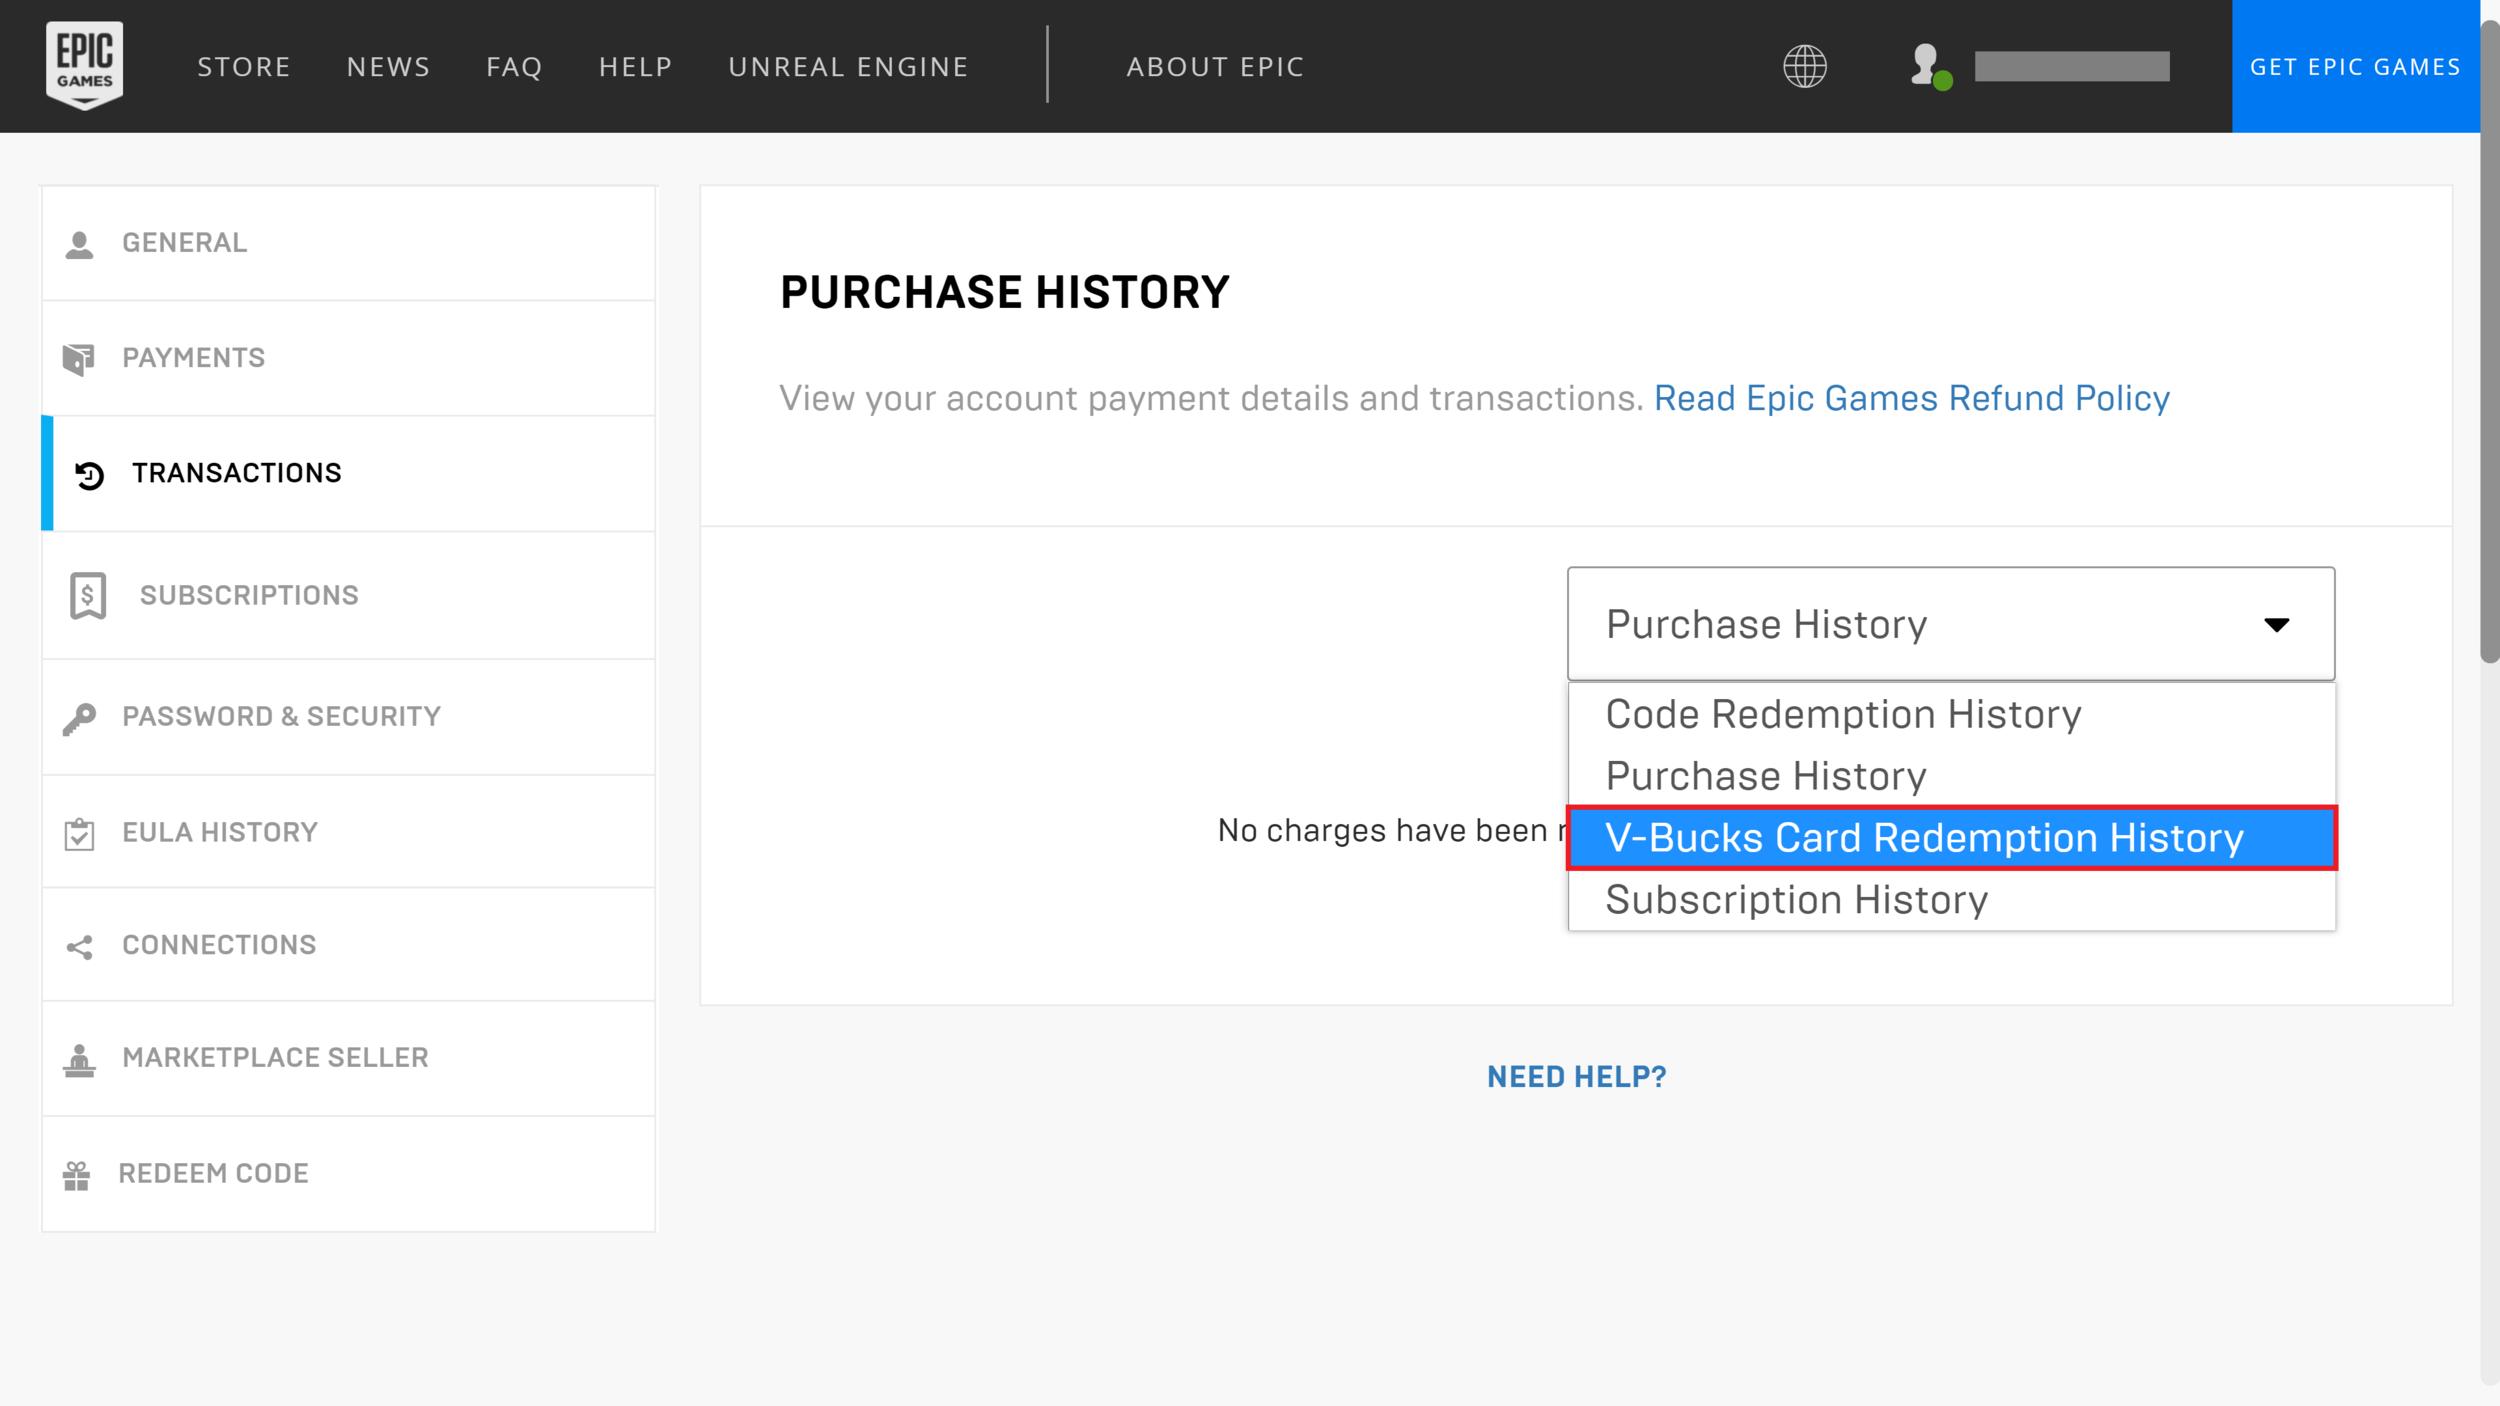 Fortnite Redeem V Bucks Code How To Redeem Fortnite Vbucks Gift Card On Xbox Max Dalton Tutorials